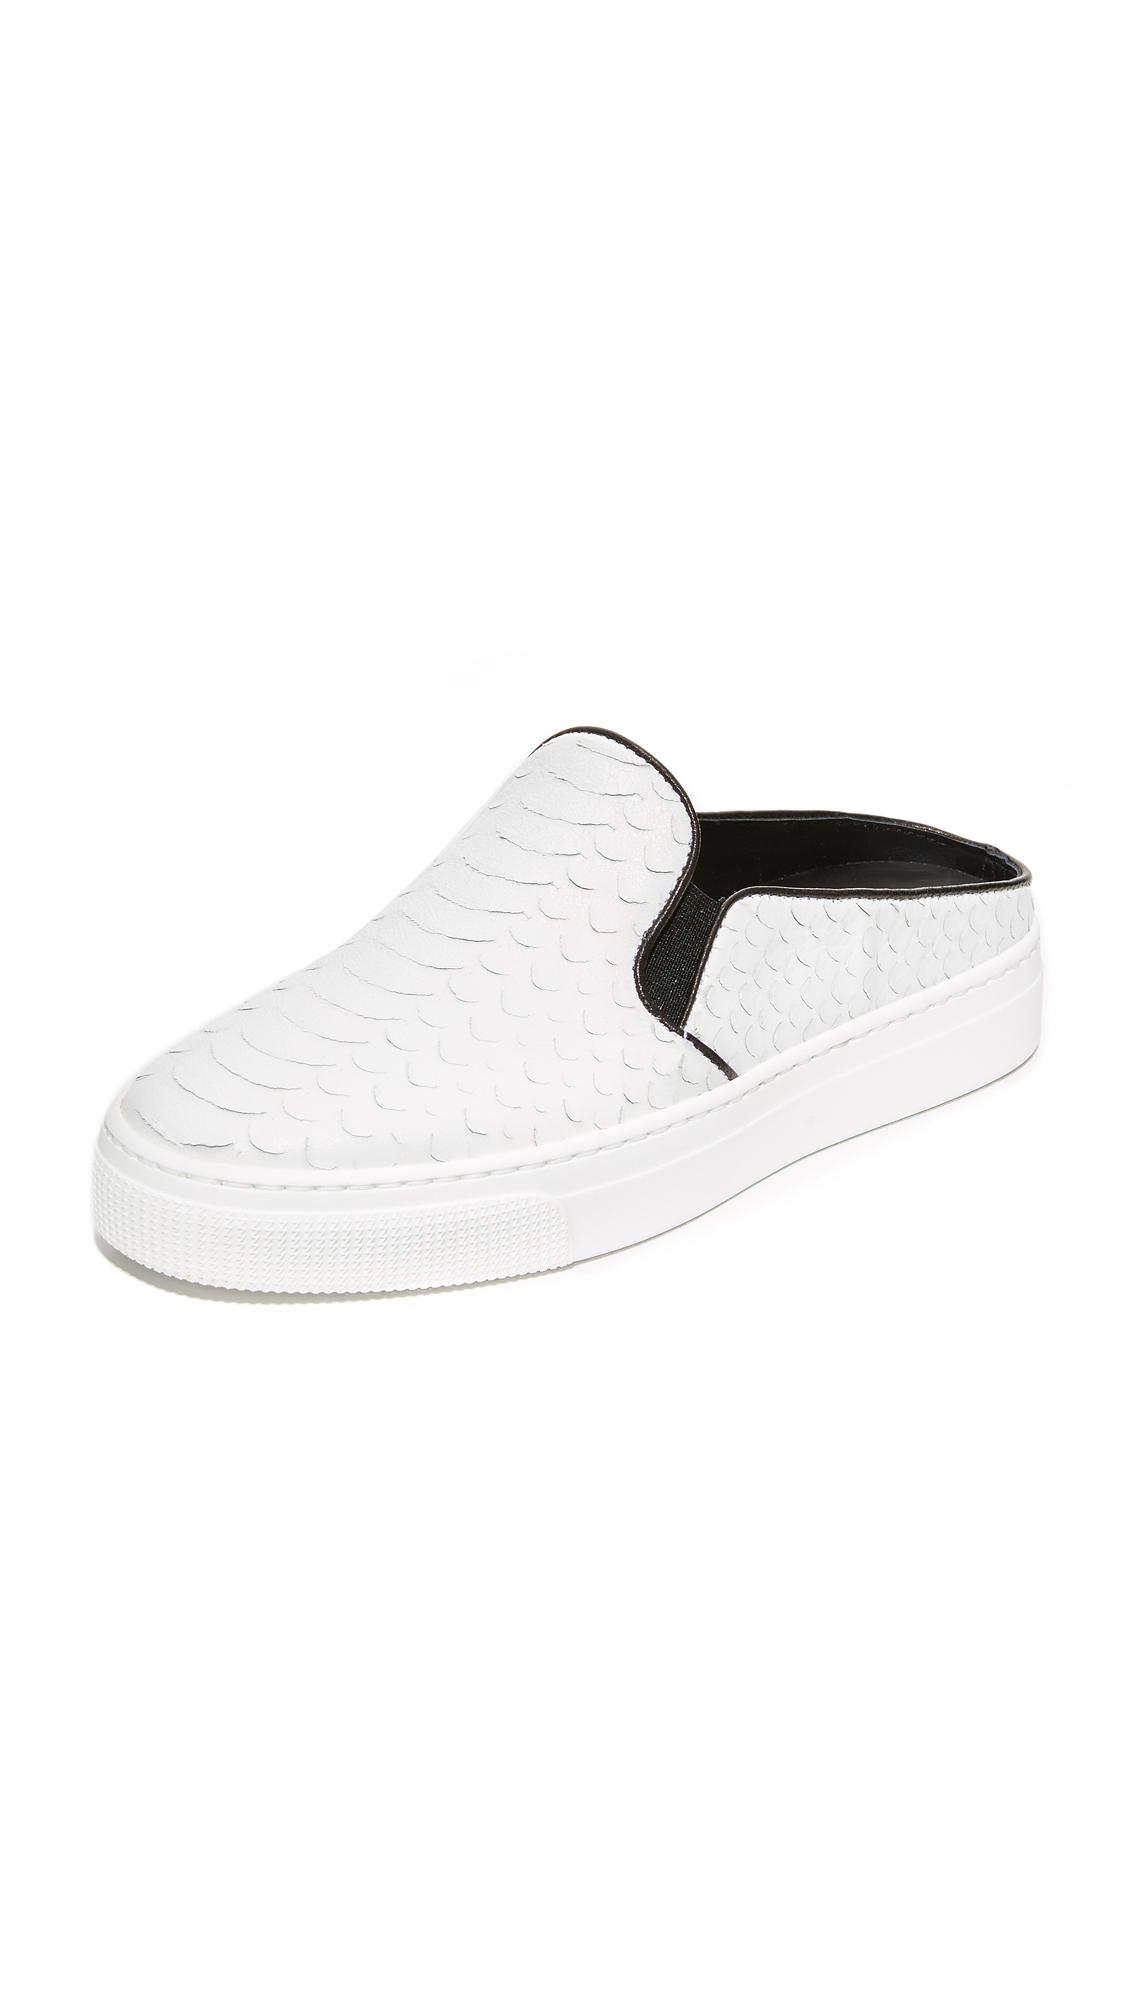 ZCD Montreal Nico Slide Sneakers - Bianco Crema